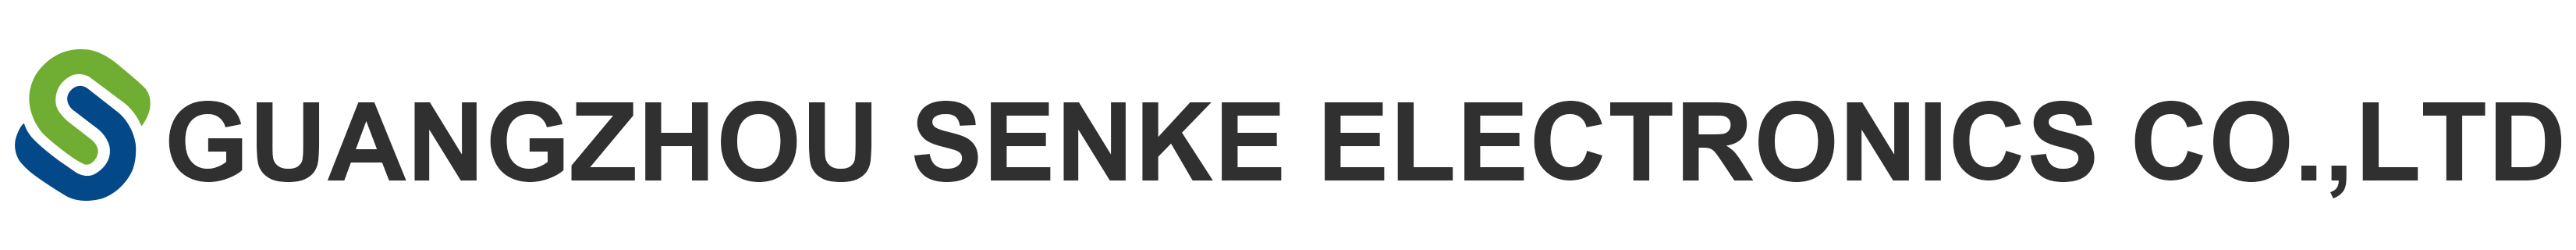 Guangzhou Senke Electronics Co.,Ltd